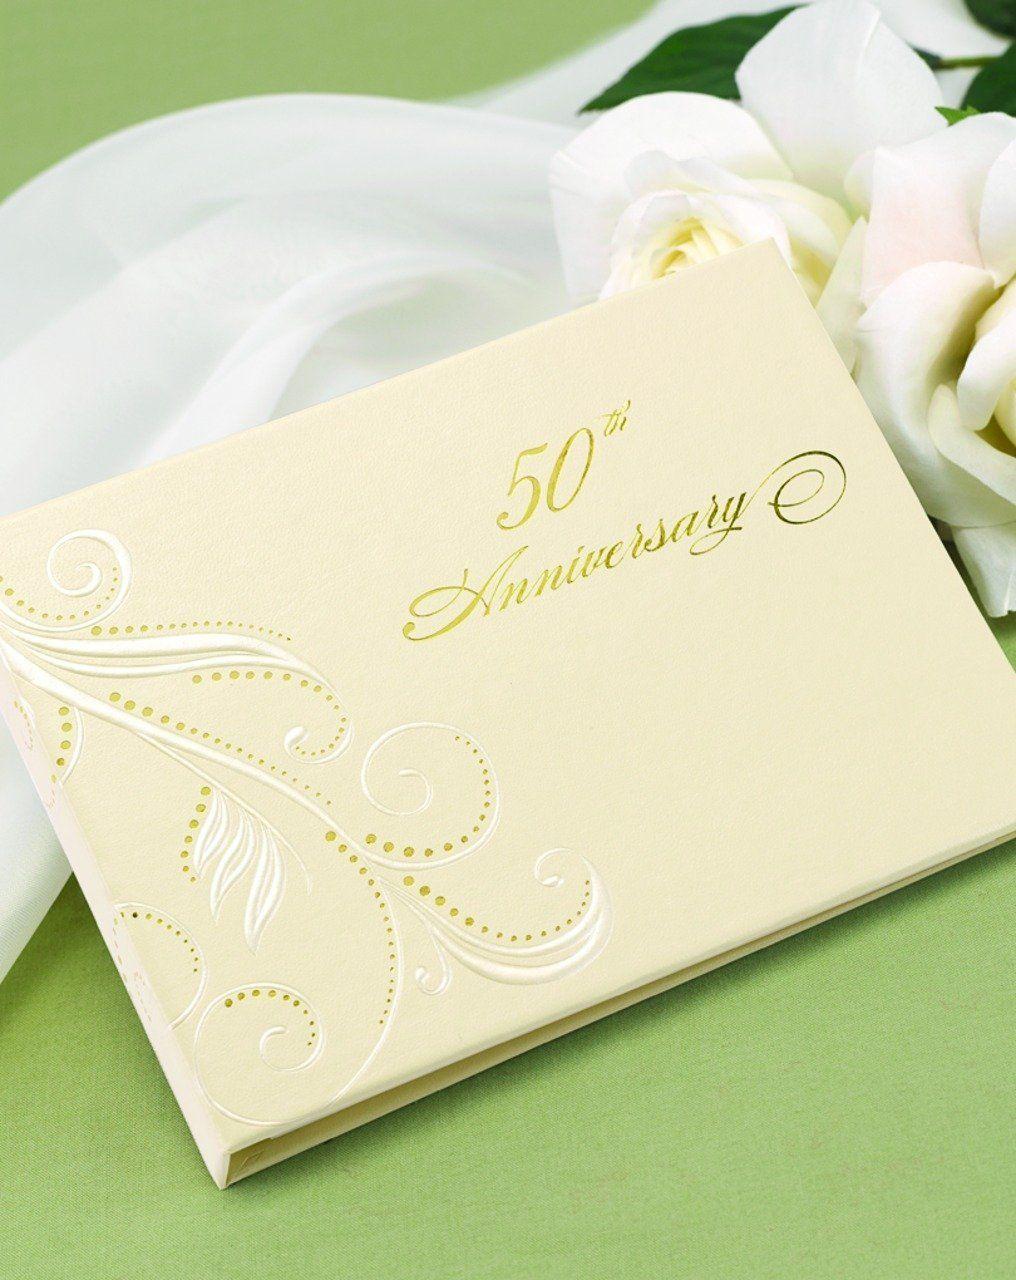 Hortense B. Hewitt Wedding Accessories 50th